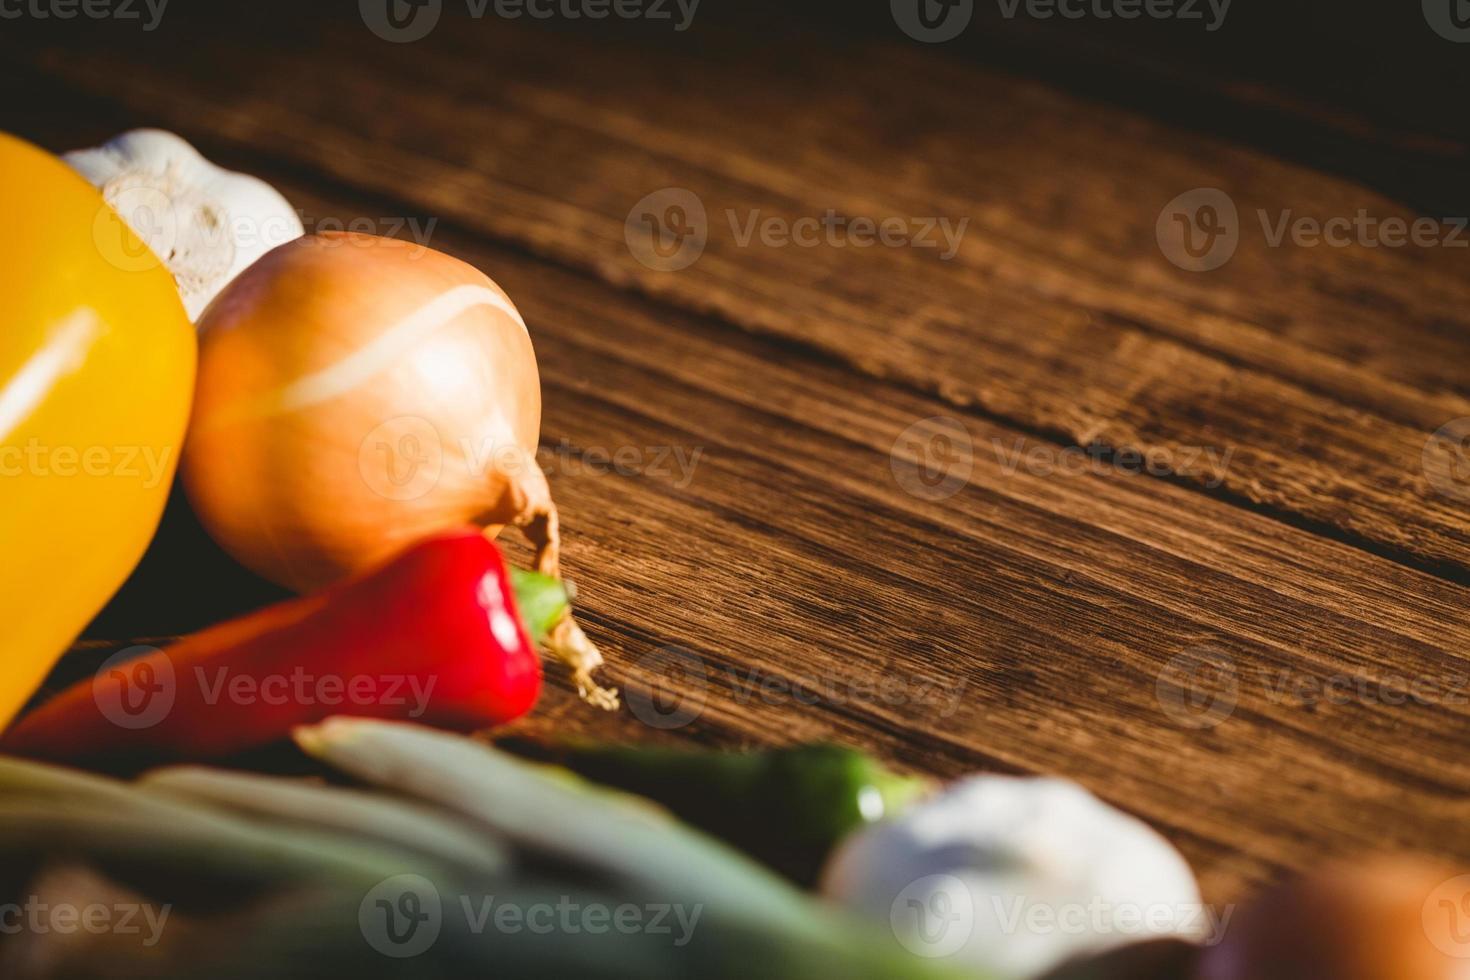 groenten neergelegd op tafel foto